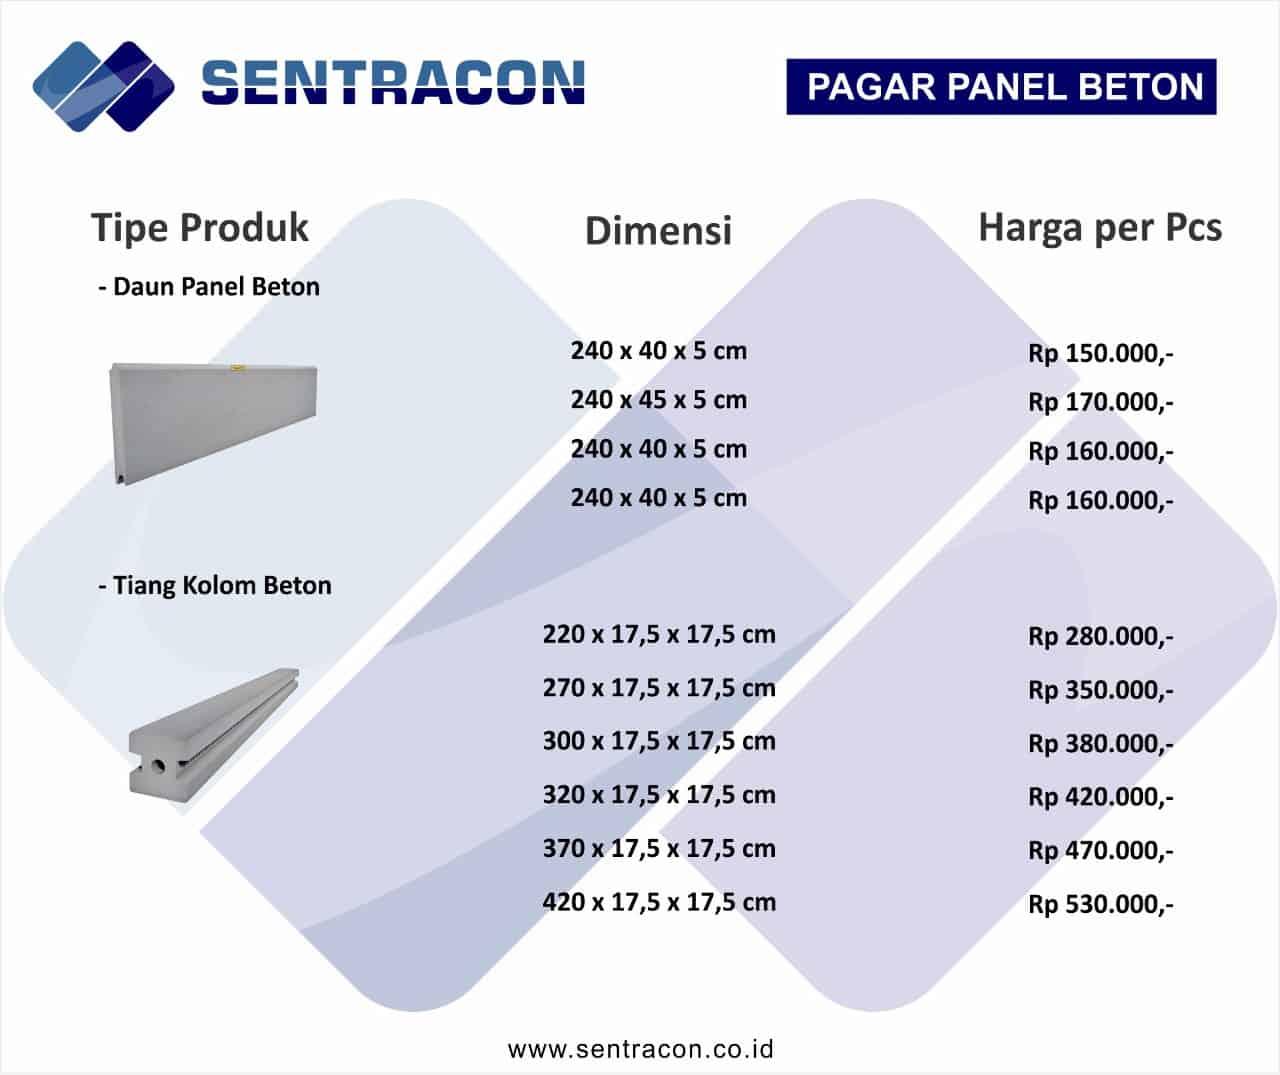 harga-pagar-beton Manfaat Mempergunakan Pagar Panel Beton